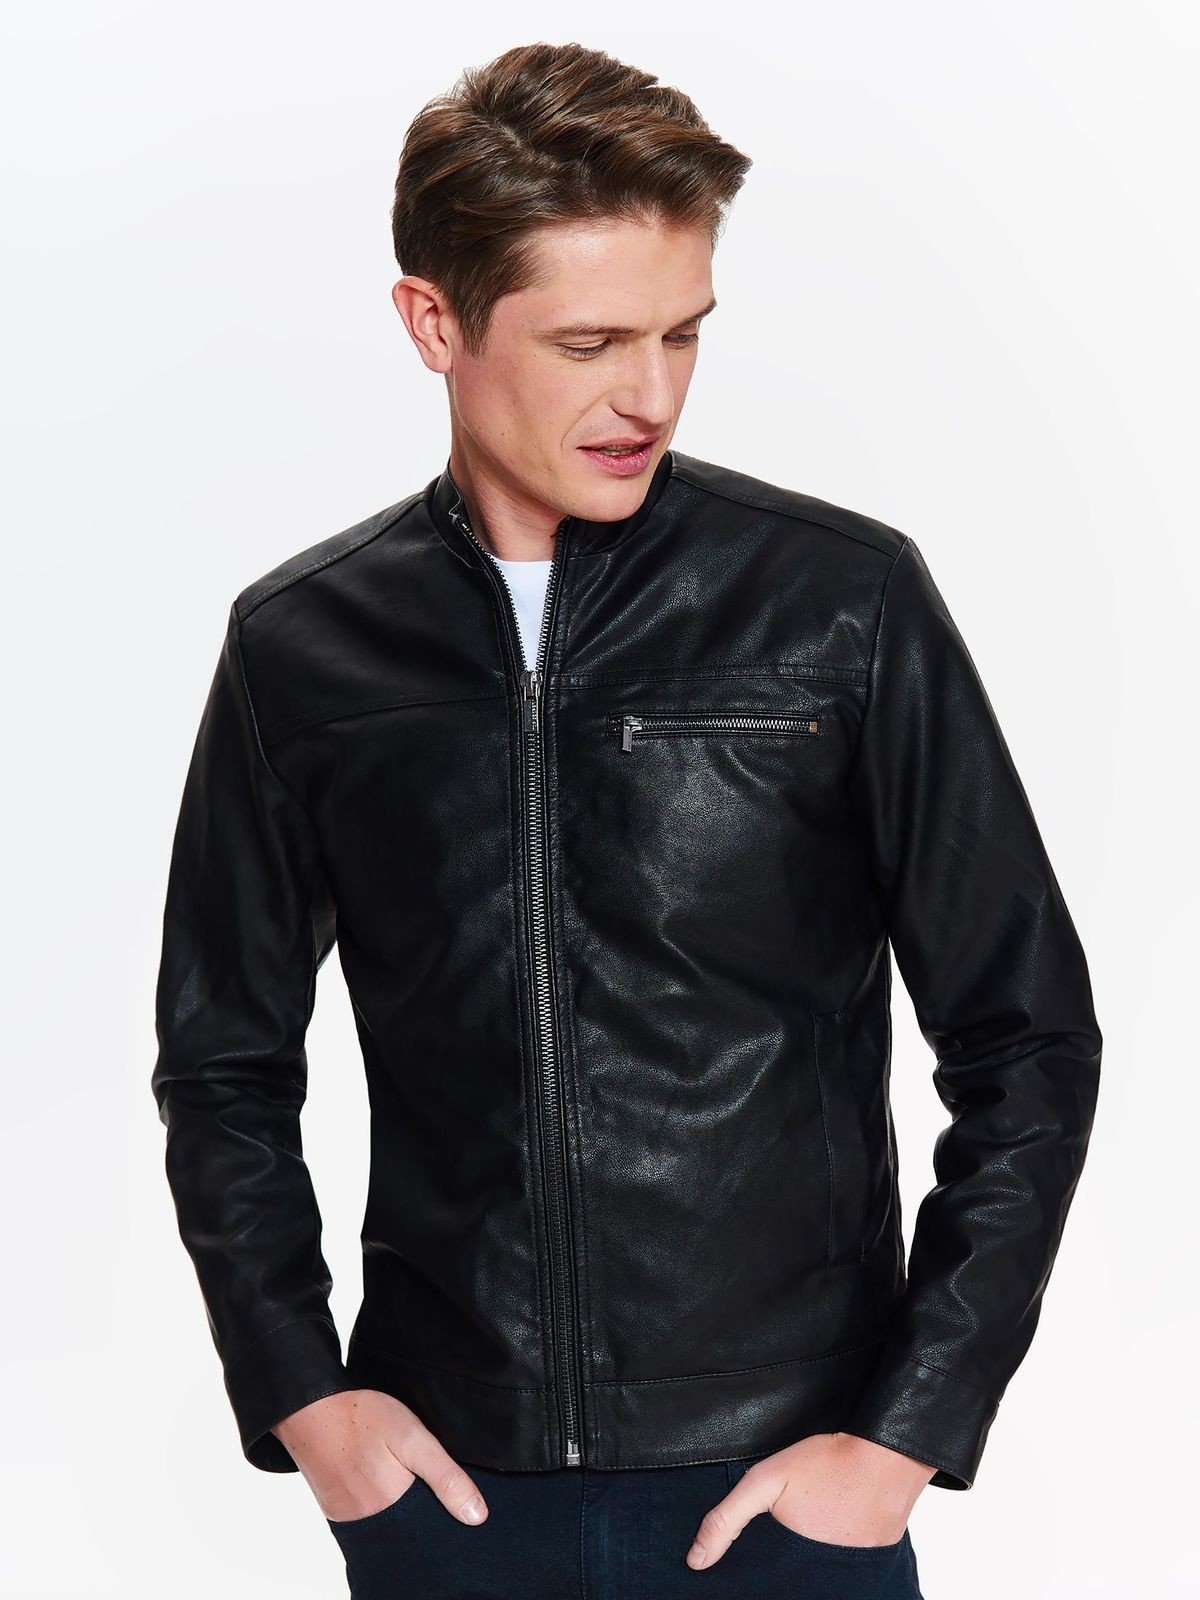 TOP SECRET TOP SECRET leather τζακετ - Glami.gr f4a8dccefc4